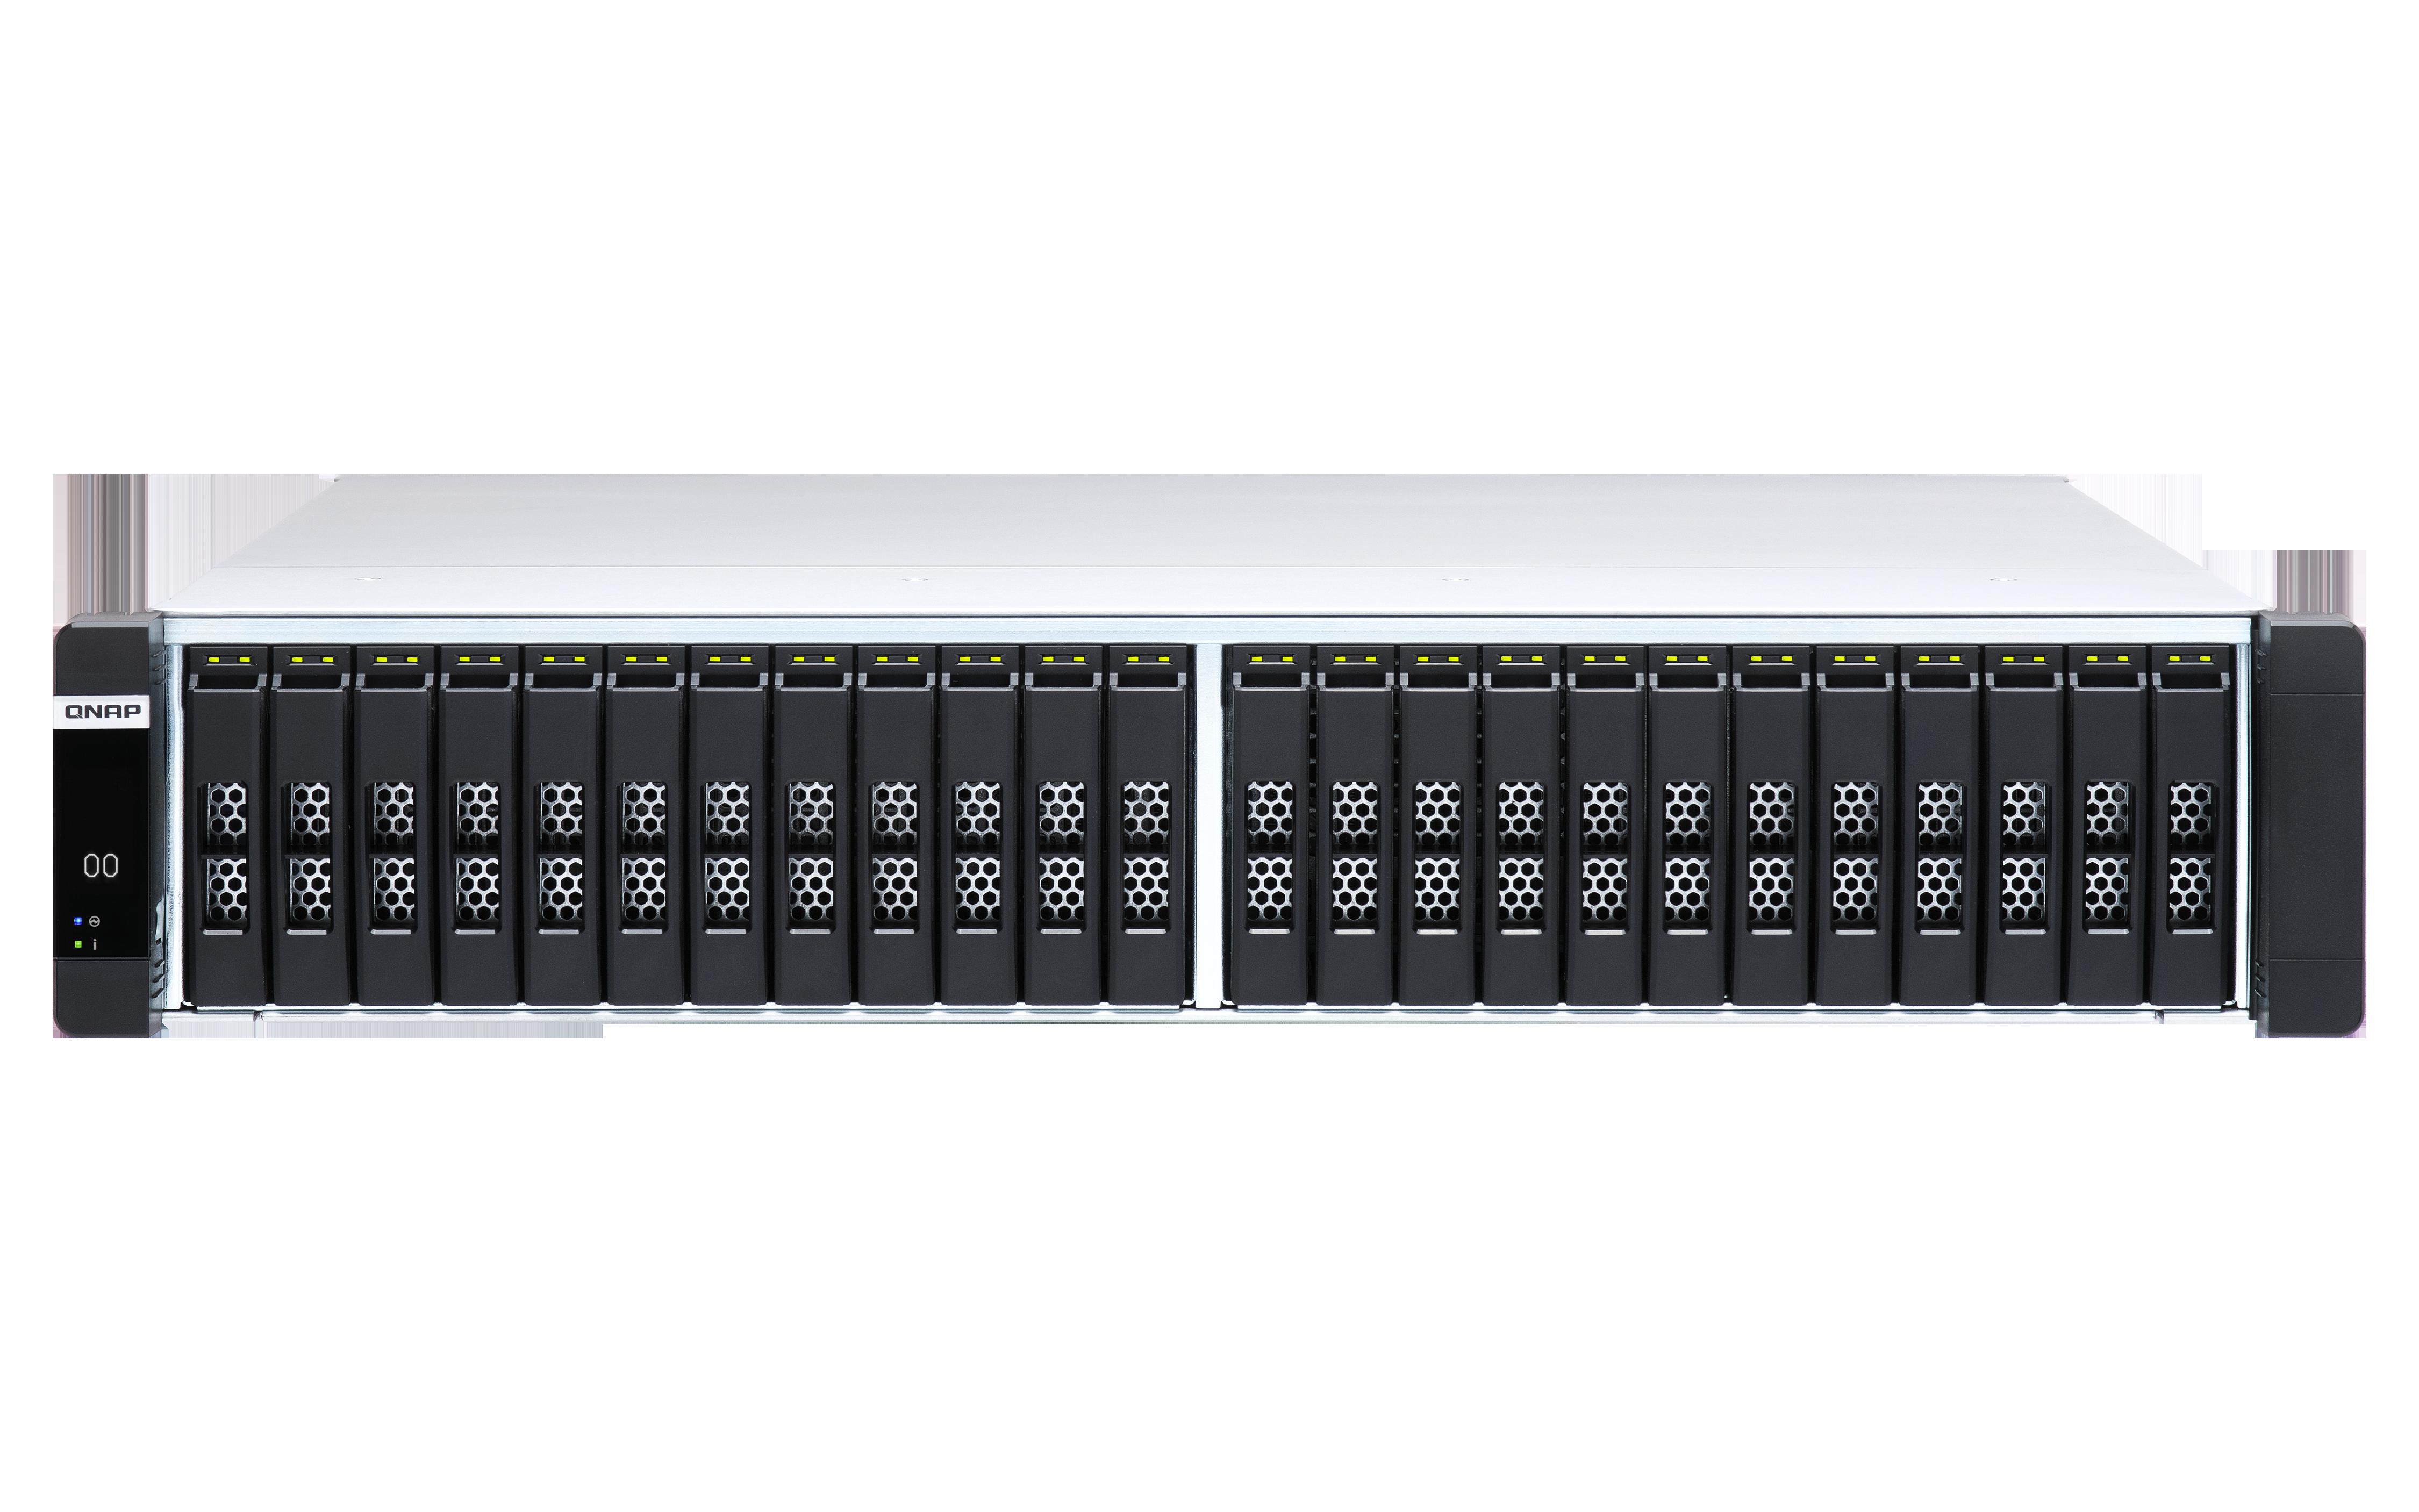 ES2486DC-2142IT-96G-US